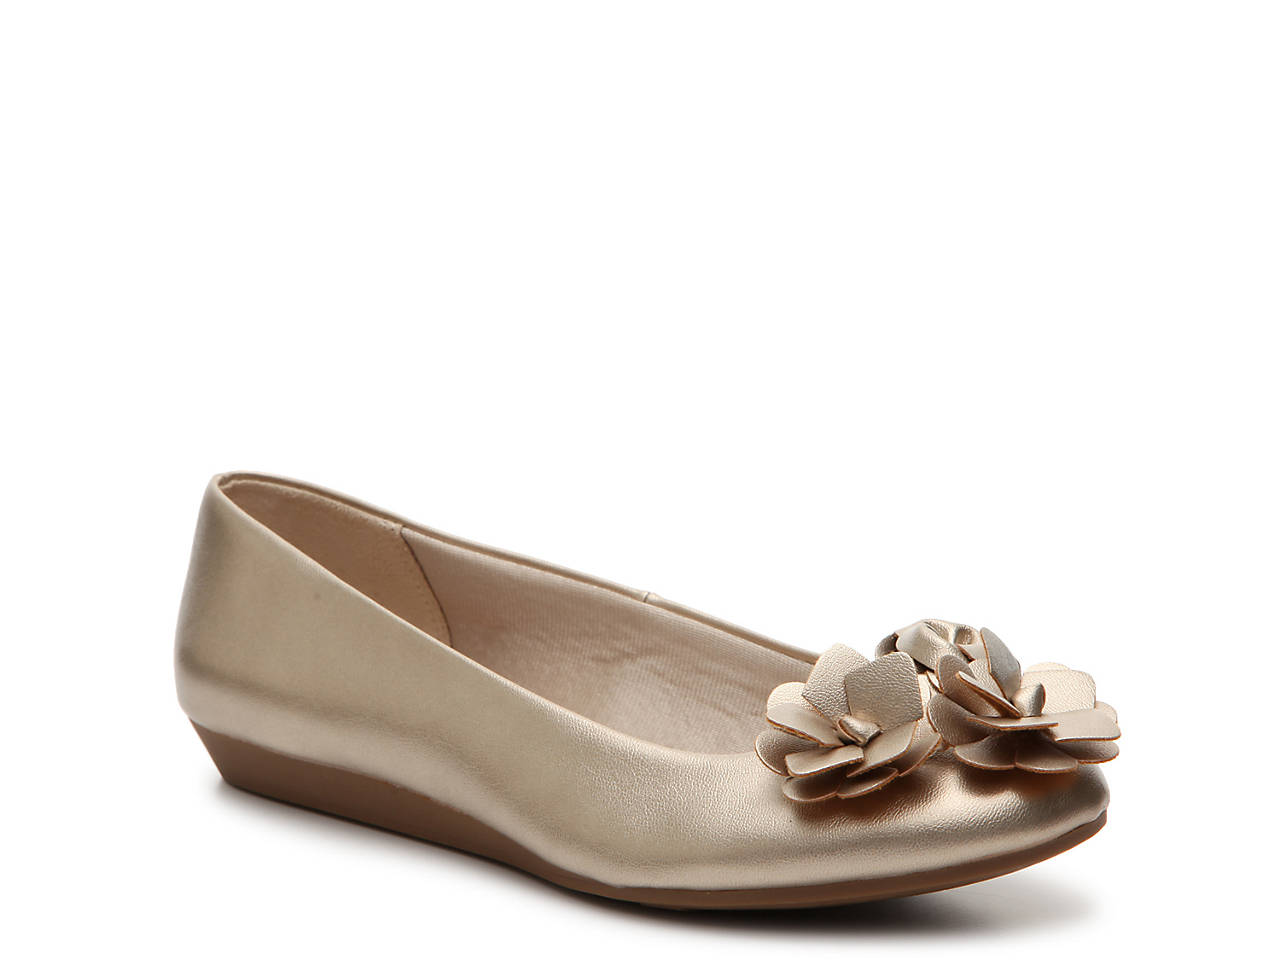 Life Stride Patina Ballet Flat (Women's) xBWAFYNj6v